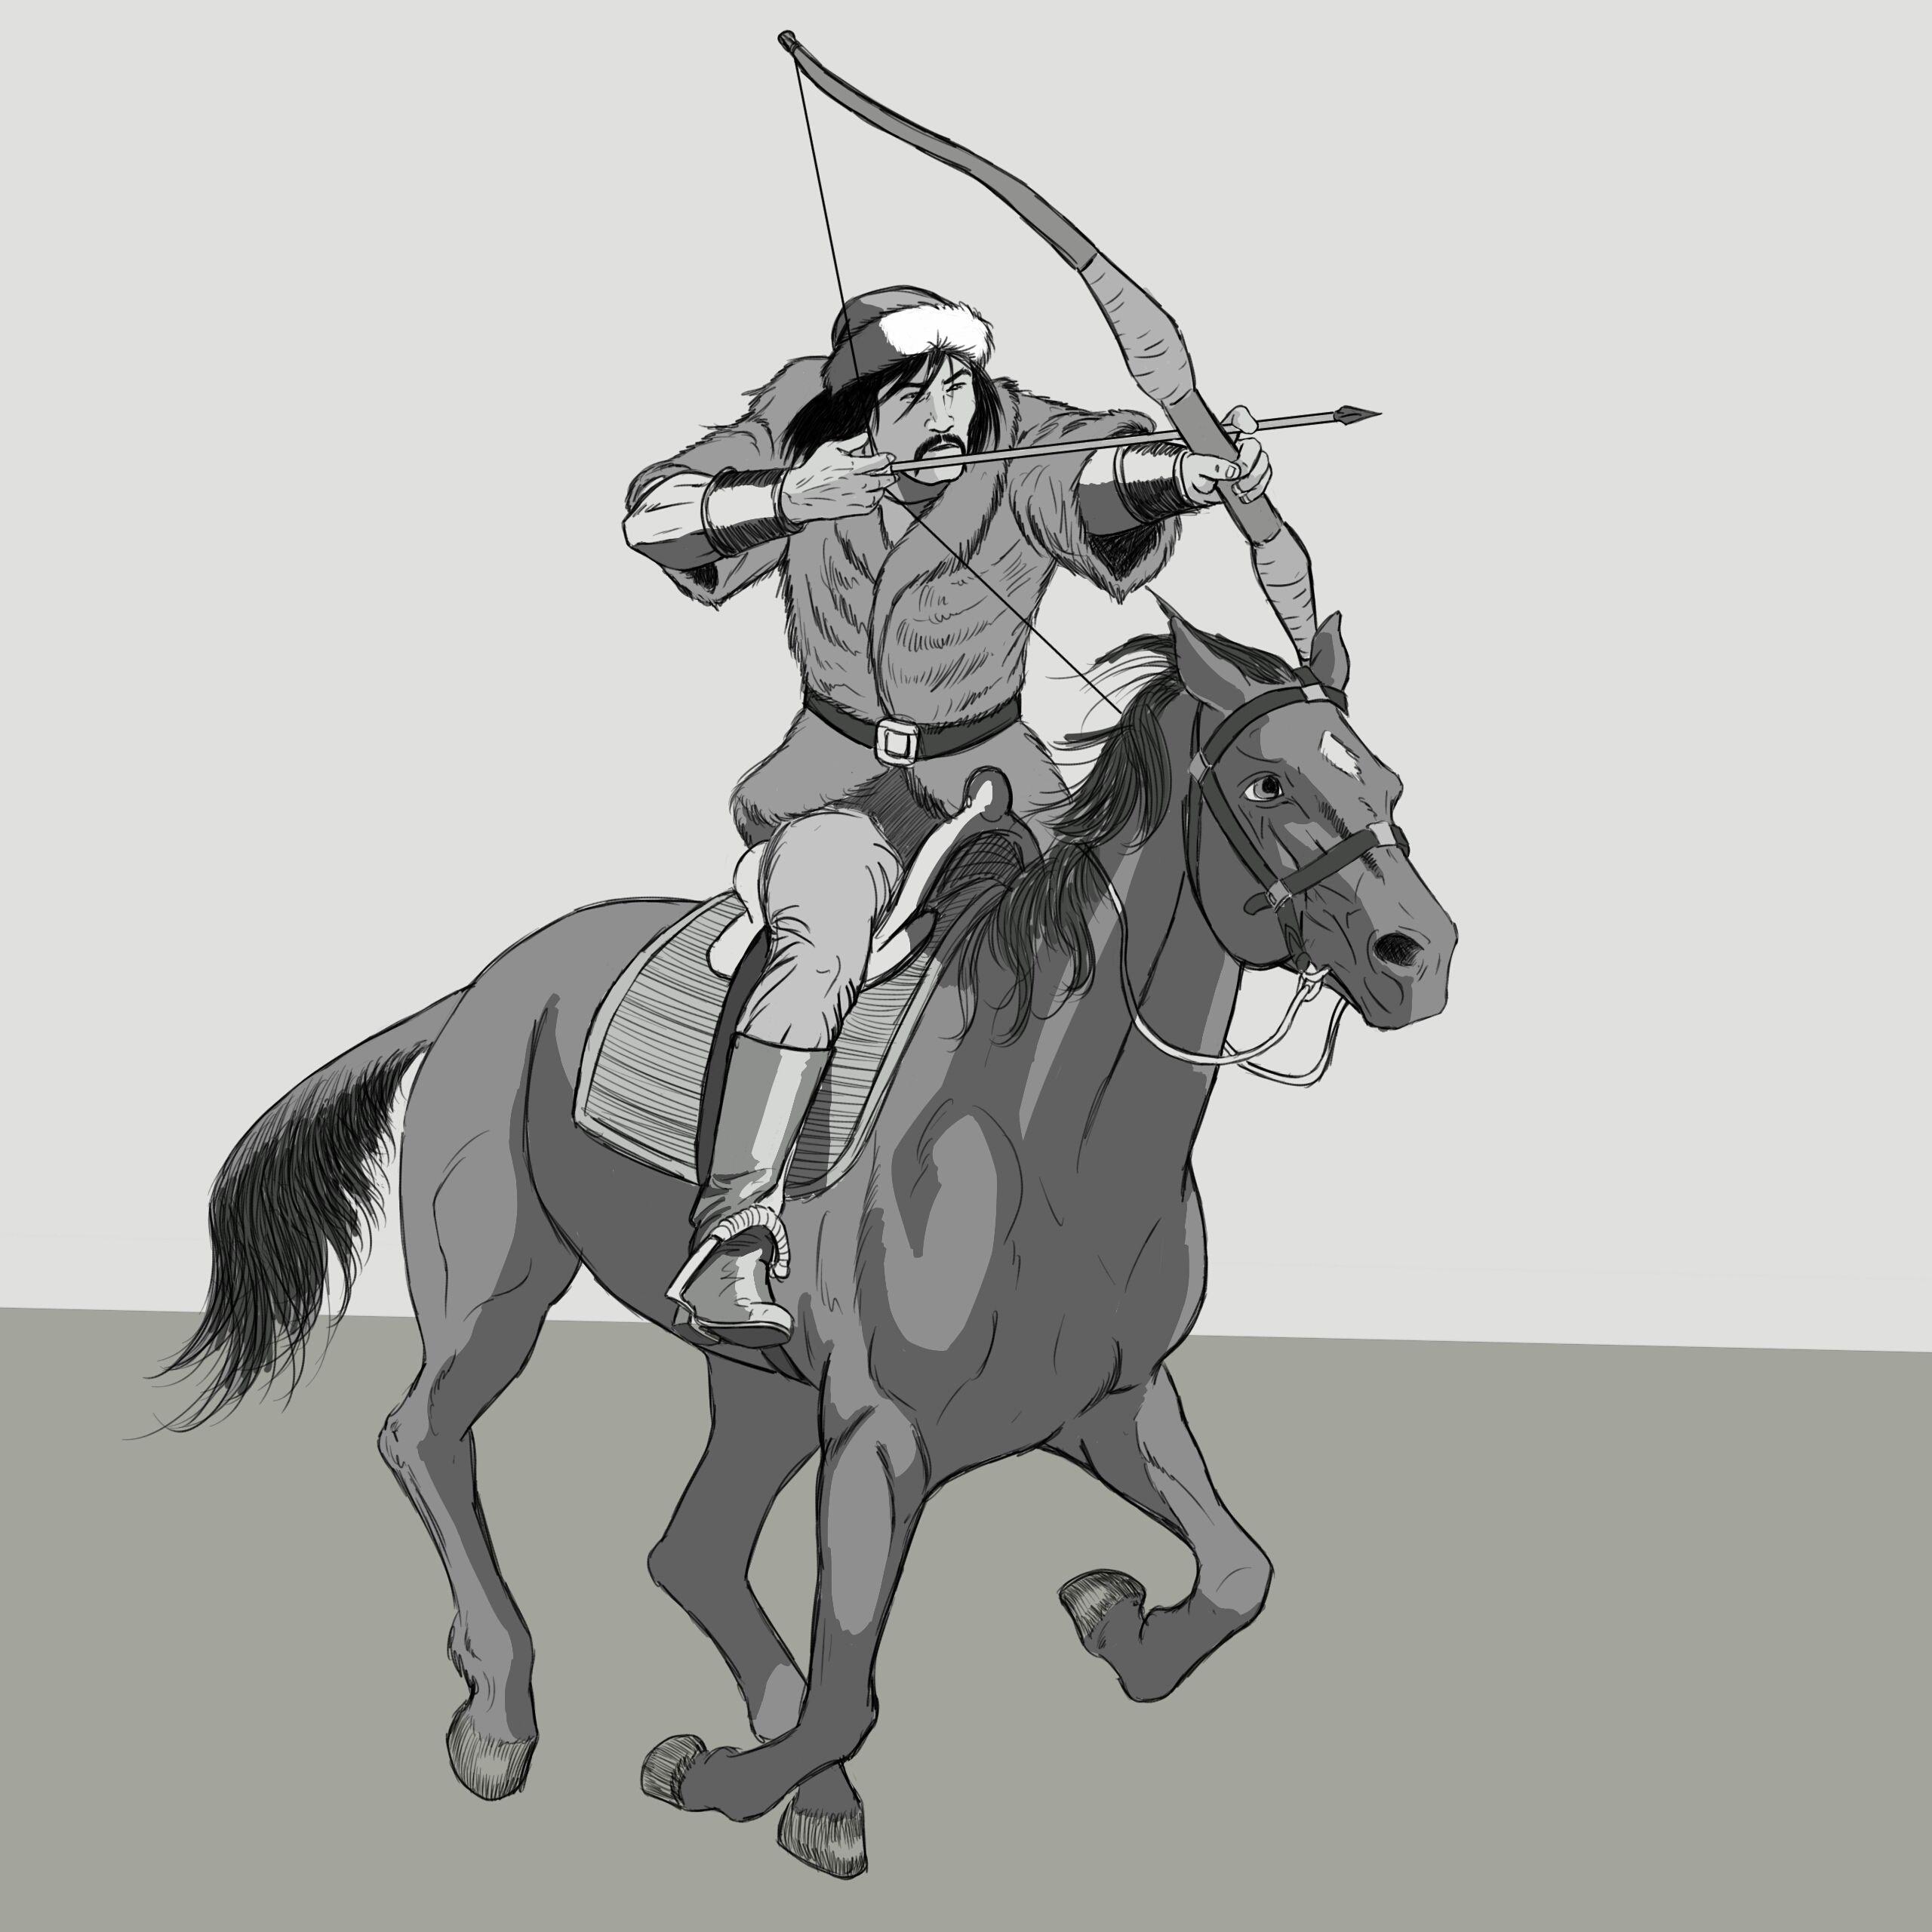 Atli Okcu Archer Turk Askeri Asian Warrior Suvari Savascilar Sanat Cizim